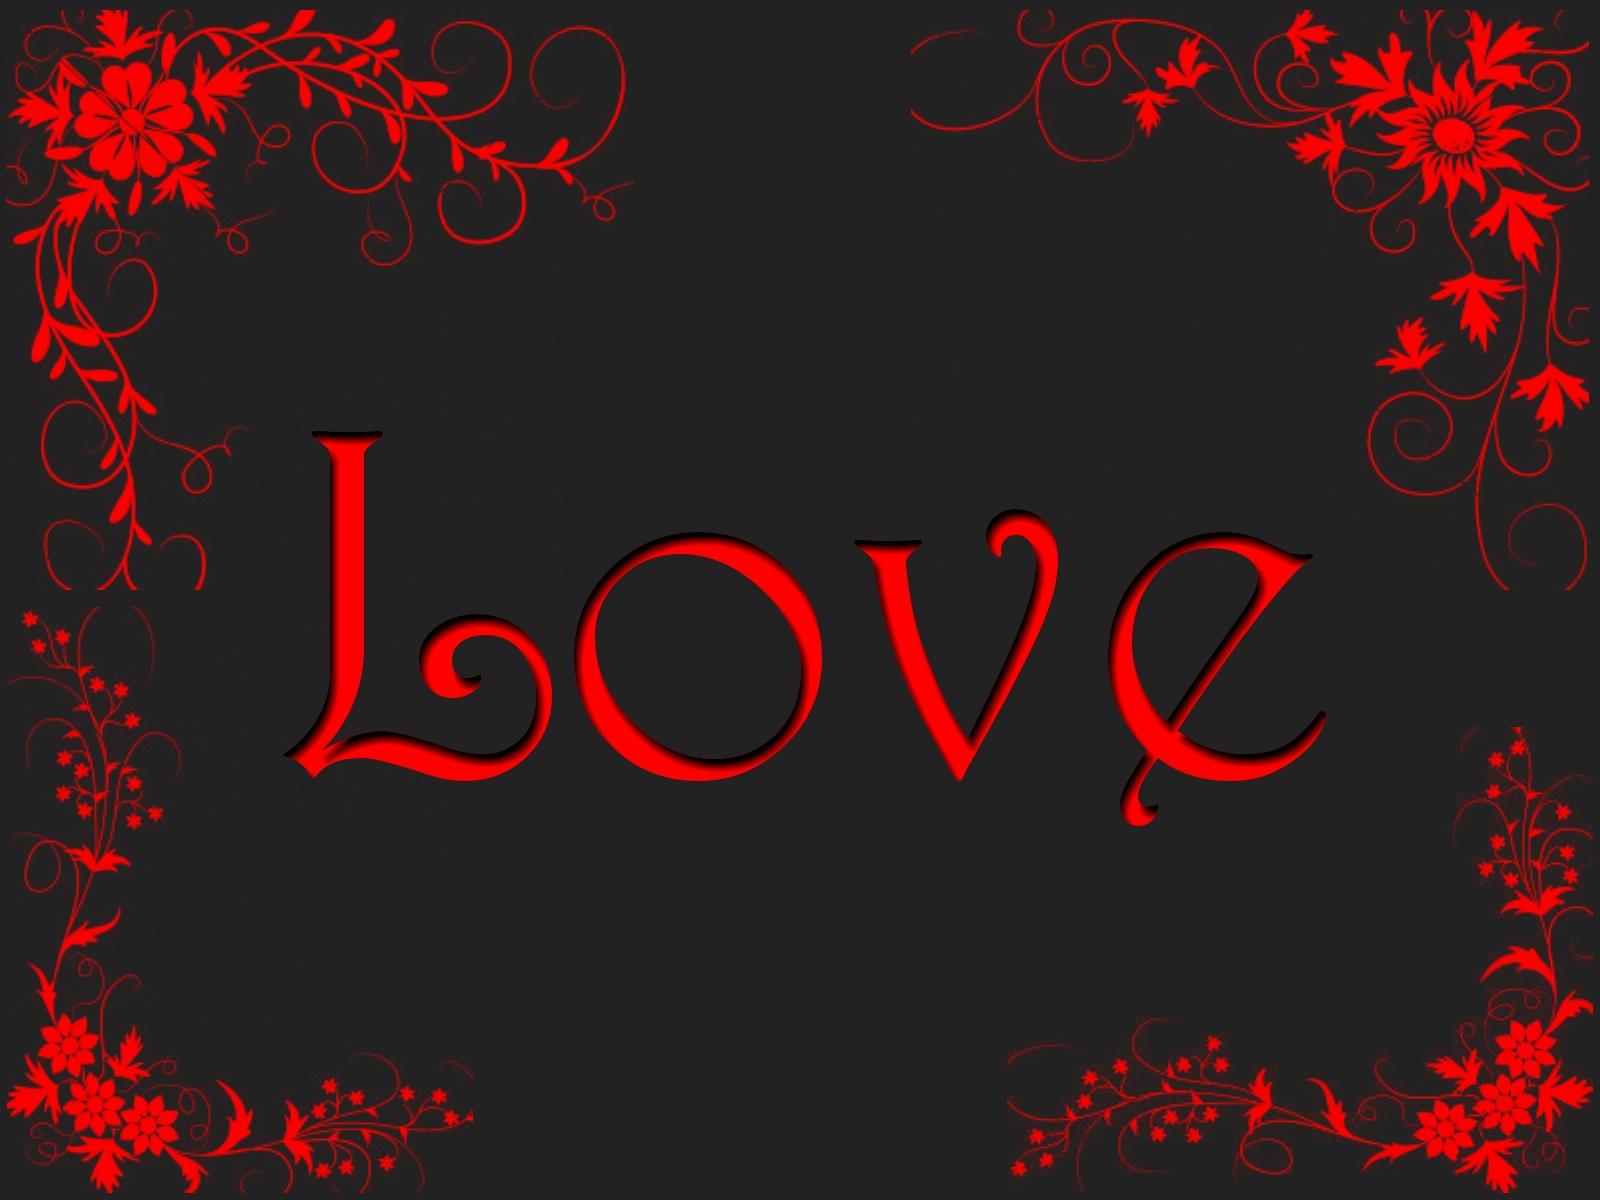 Real Blood Love Wallpaper : Love HD Wallpapers - Best HD Wallpapers